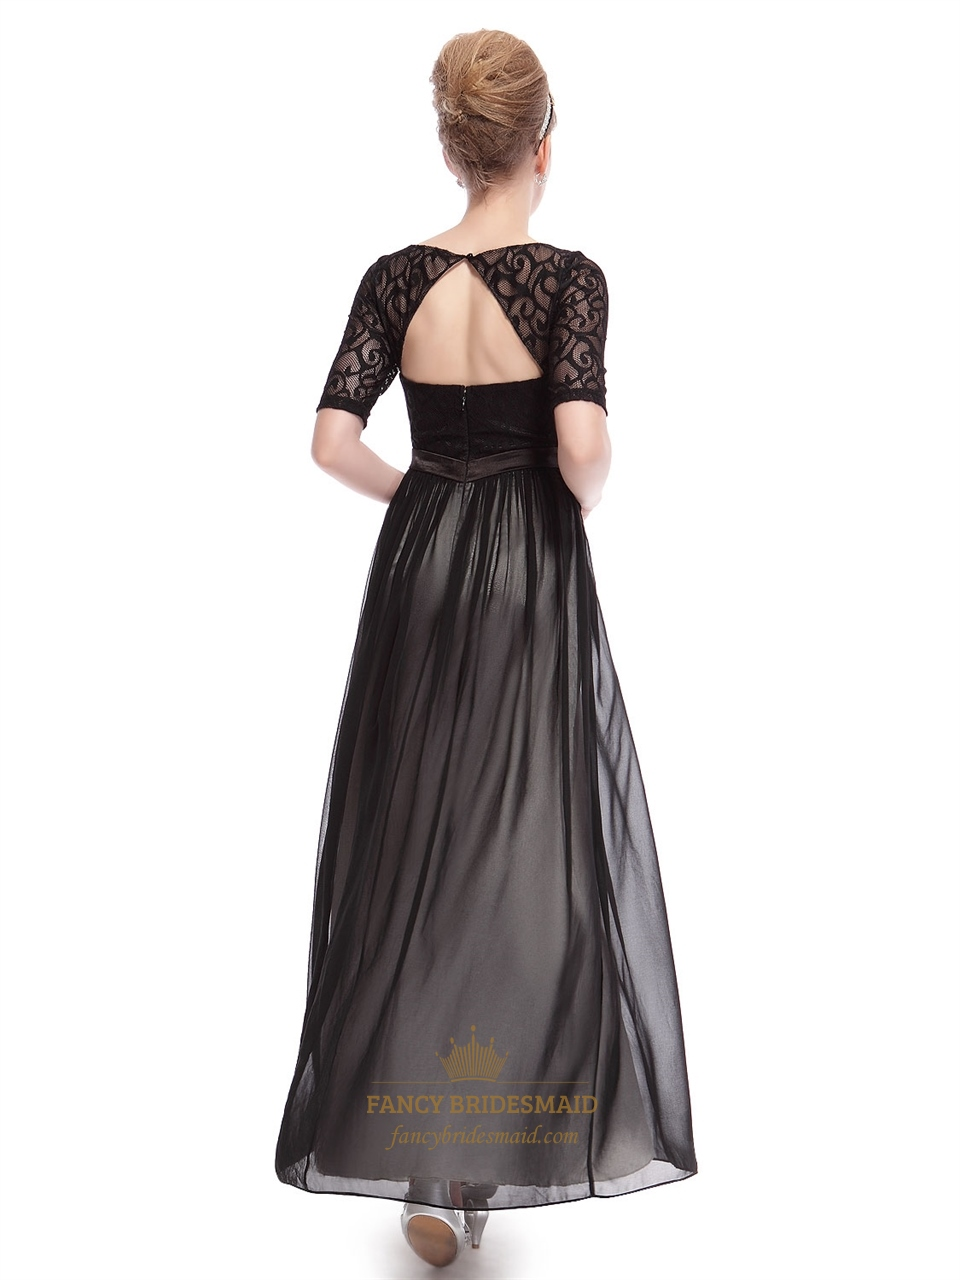 Elegant Black Dresses With Lace Long Sleeves Overlay,Long Black ...